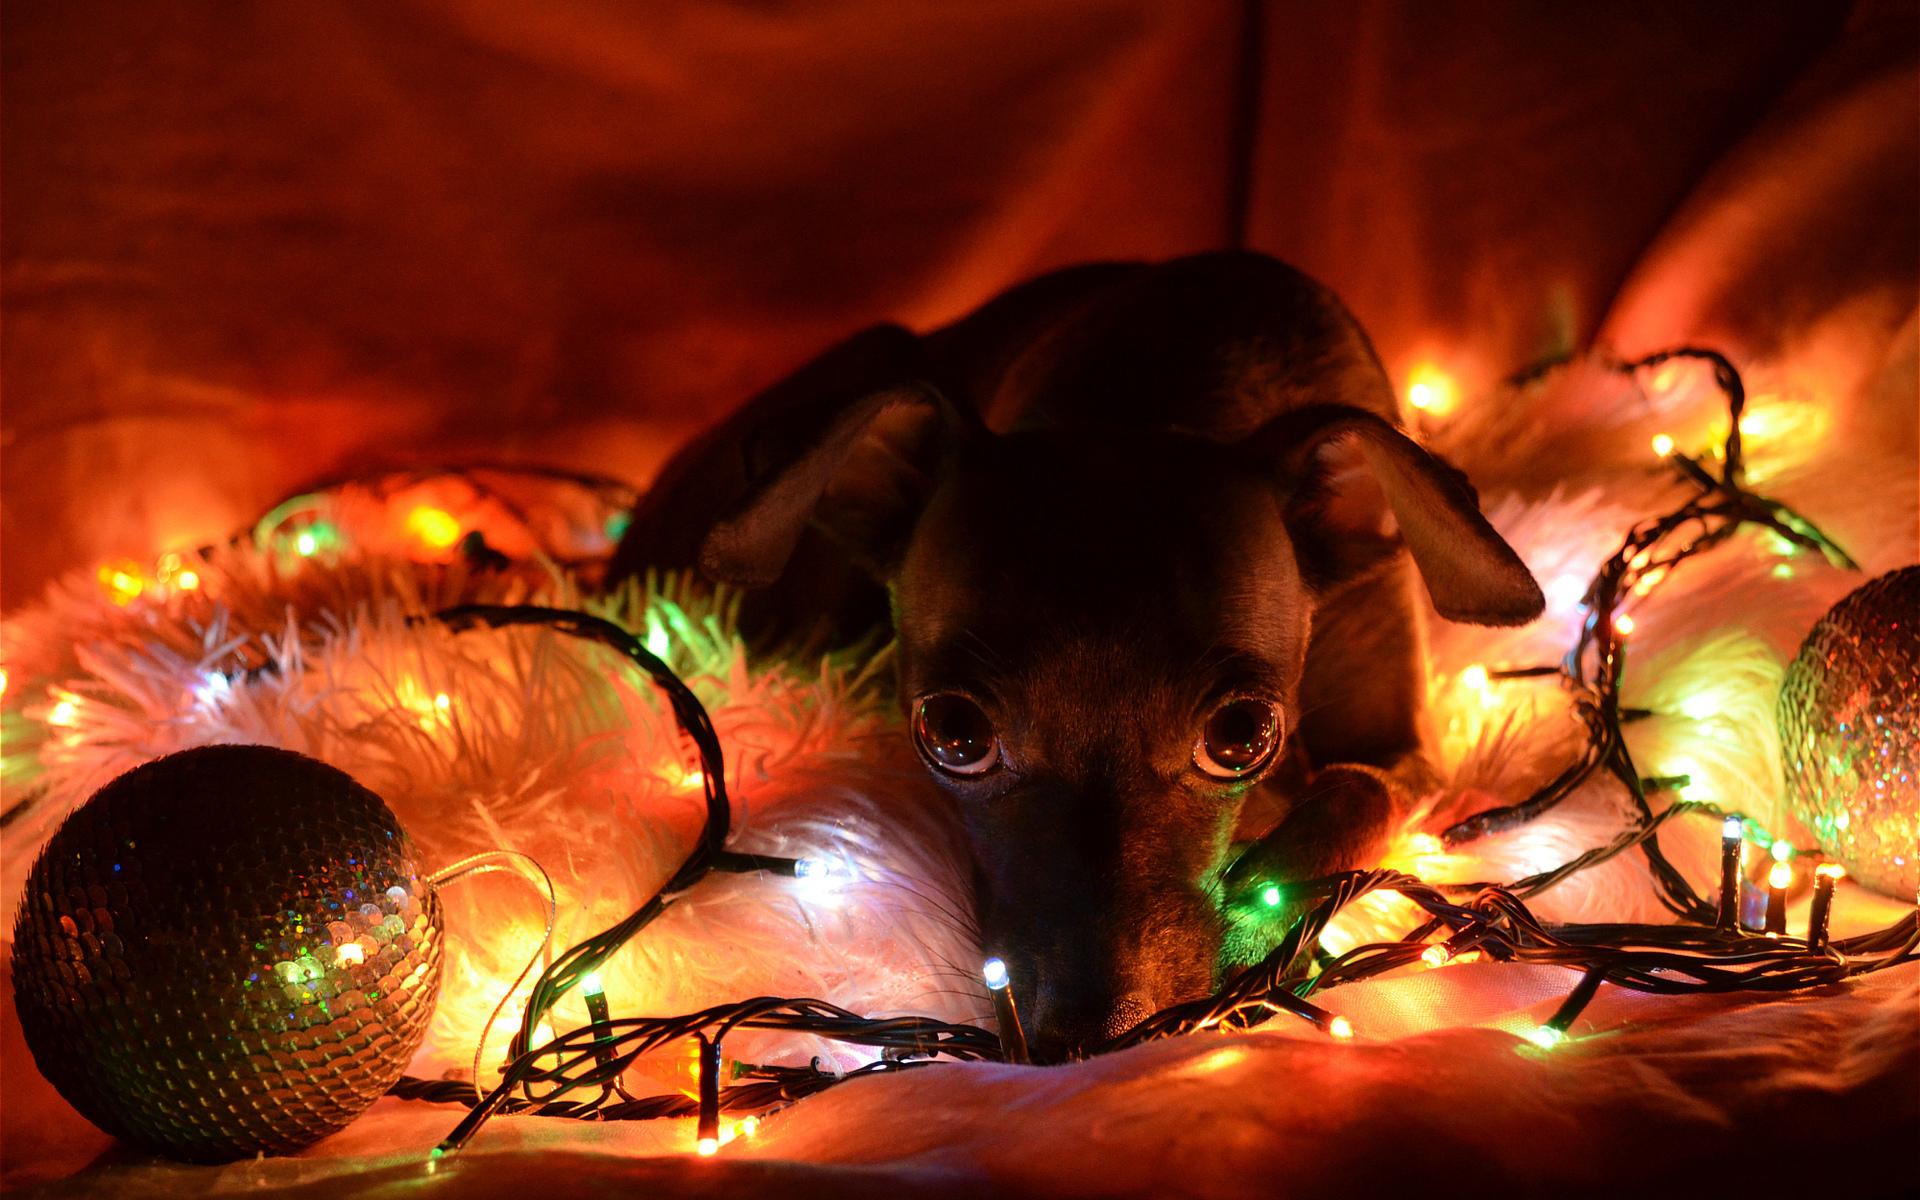 lights new year christmas dogs wallpaper 1920x1200 69033 wallpaperup